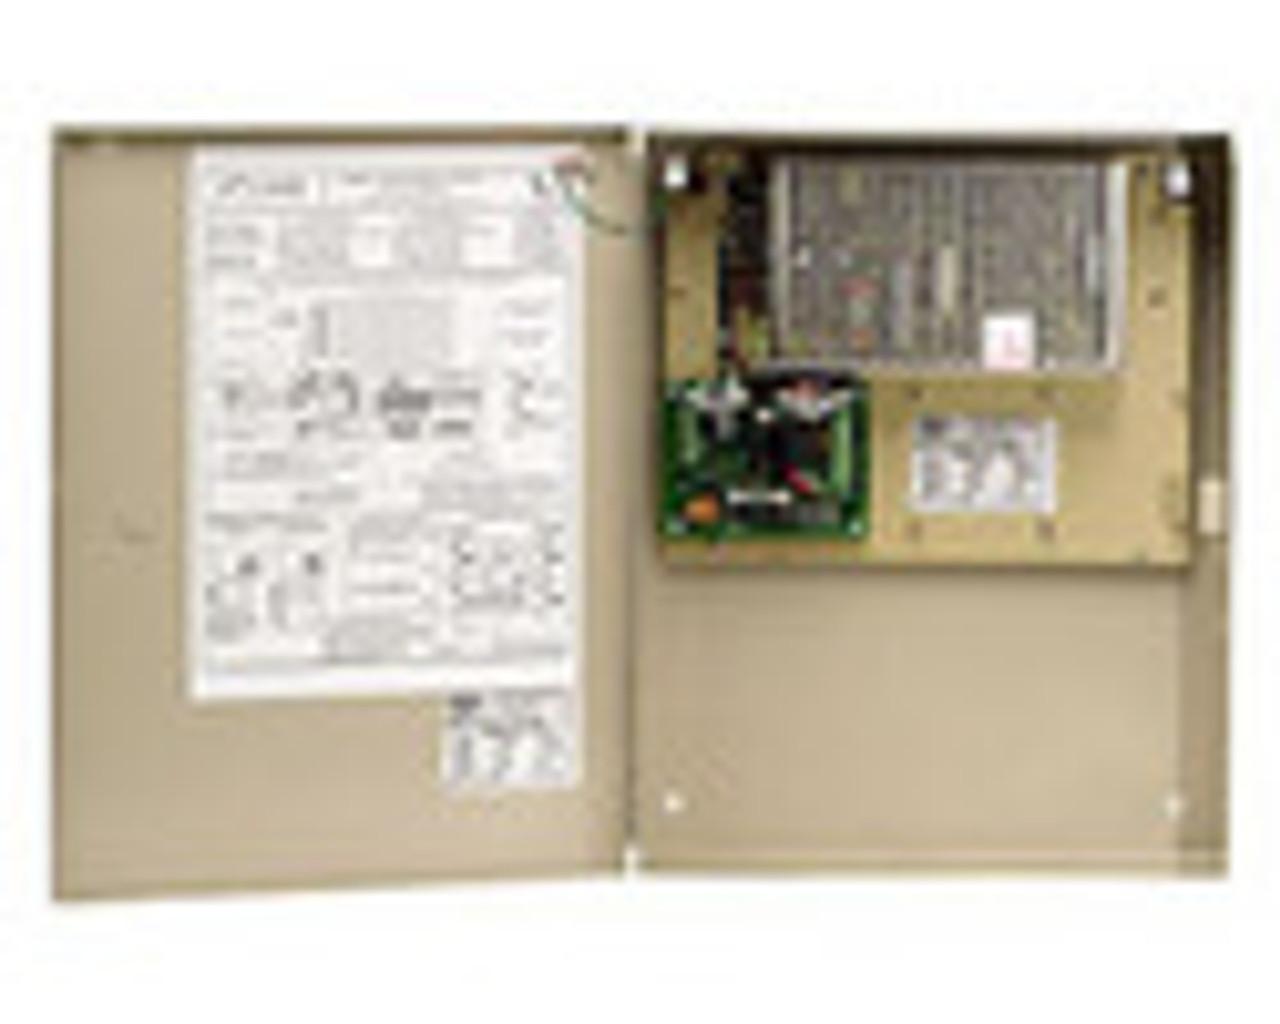 5600-12-ATS DynaLock Multi Zone Heavy Duty 12 VDC Power Supply with Anti-Tamper Switch